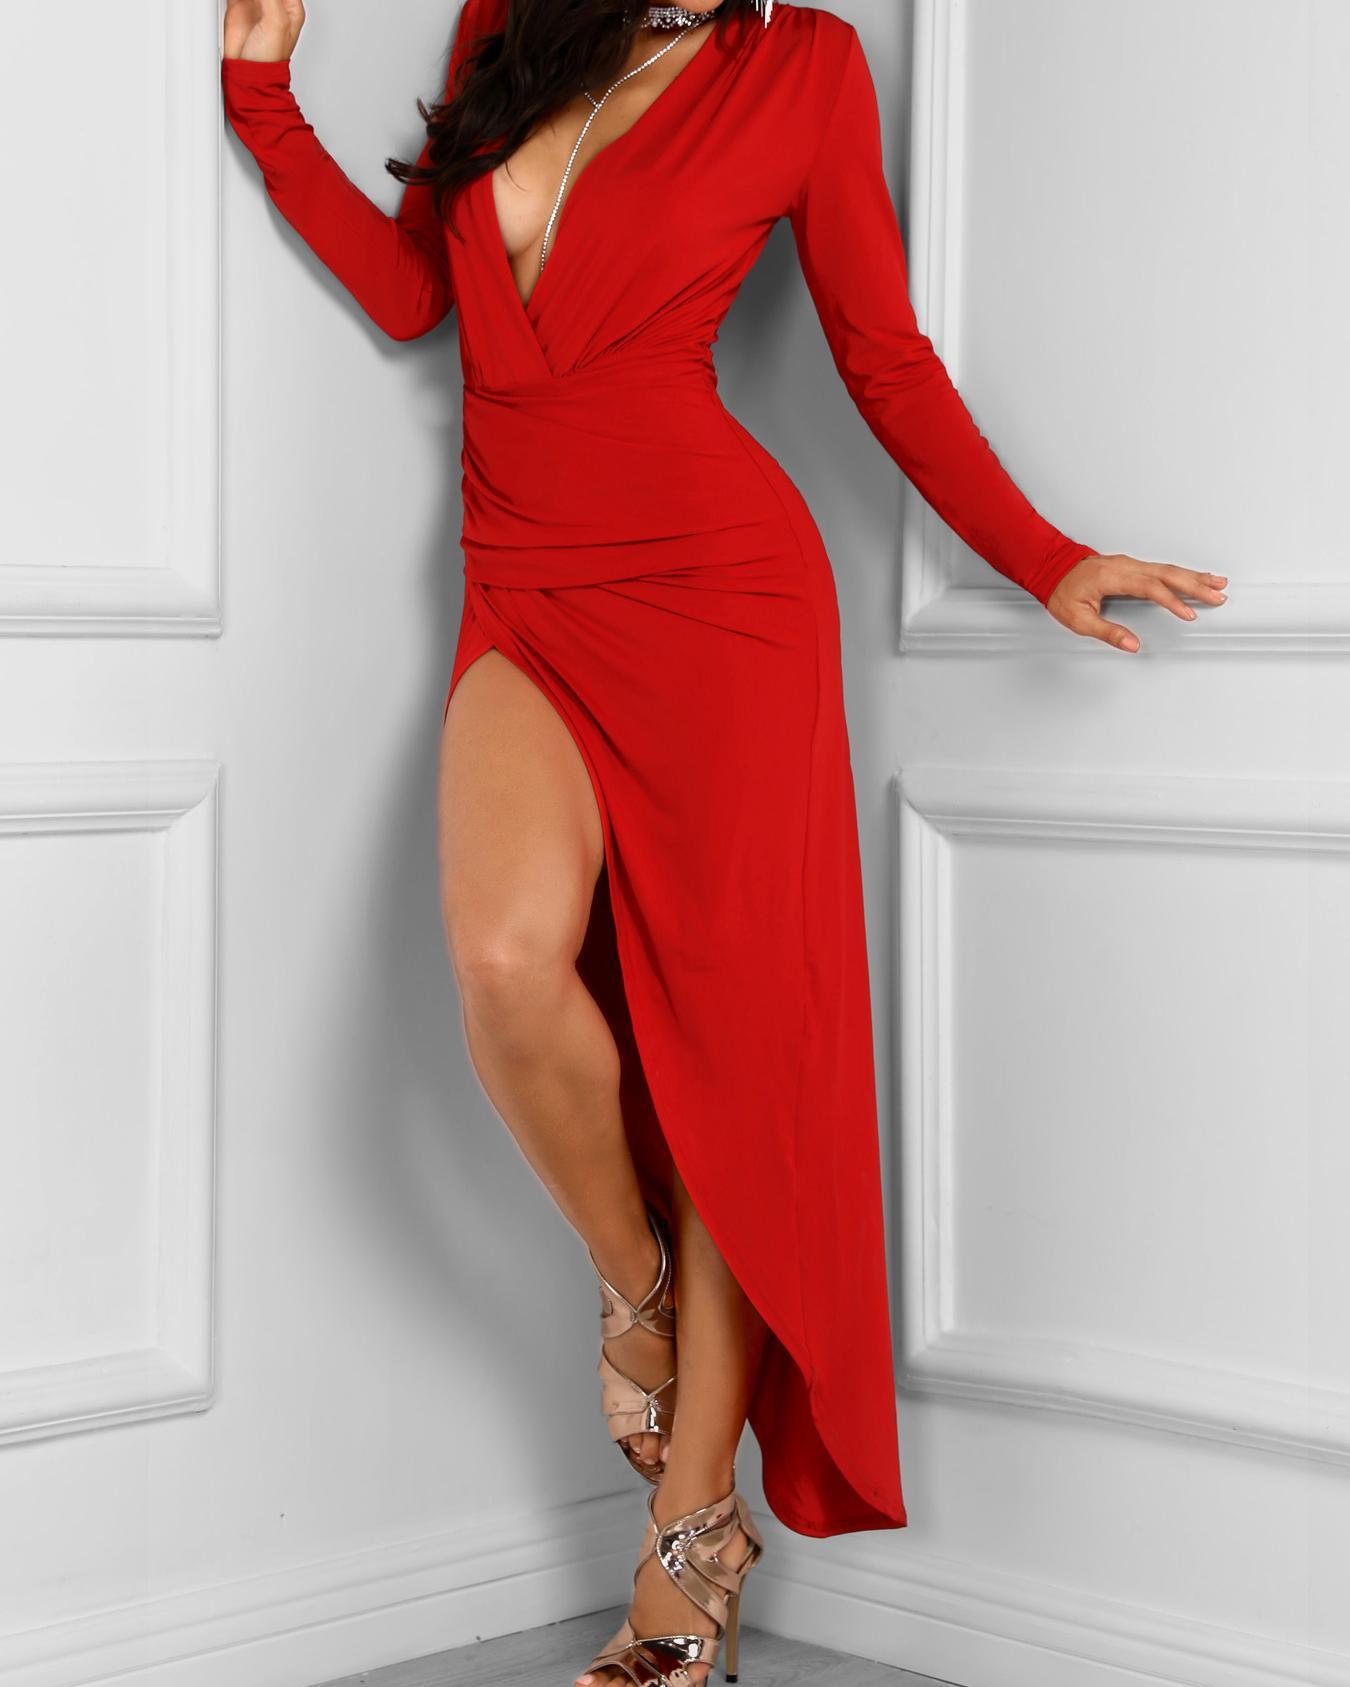 ivrose / Vestido de fiesta irregular de manga larga con pliegues irregulares